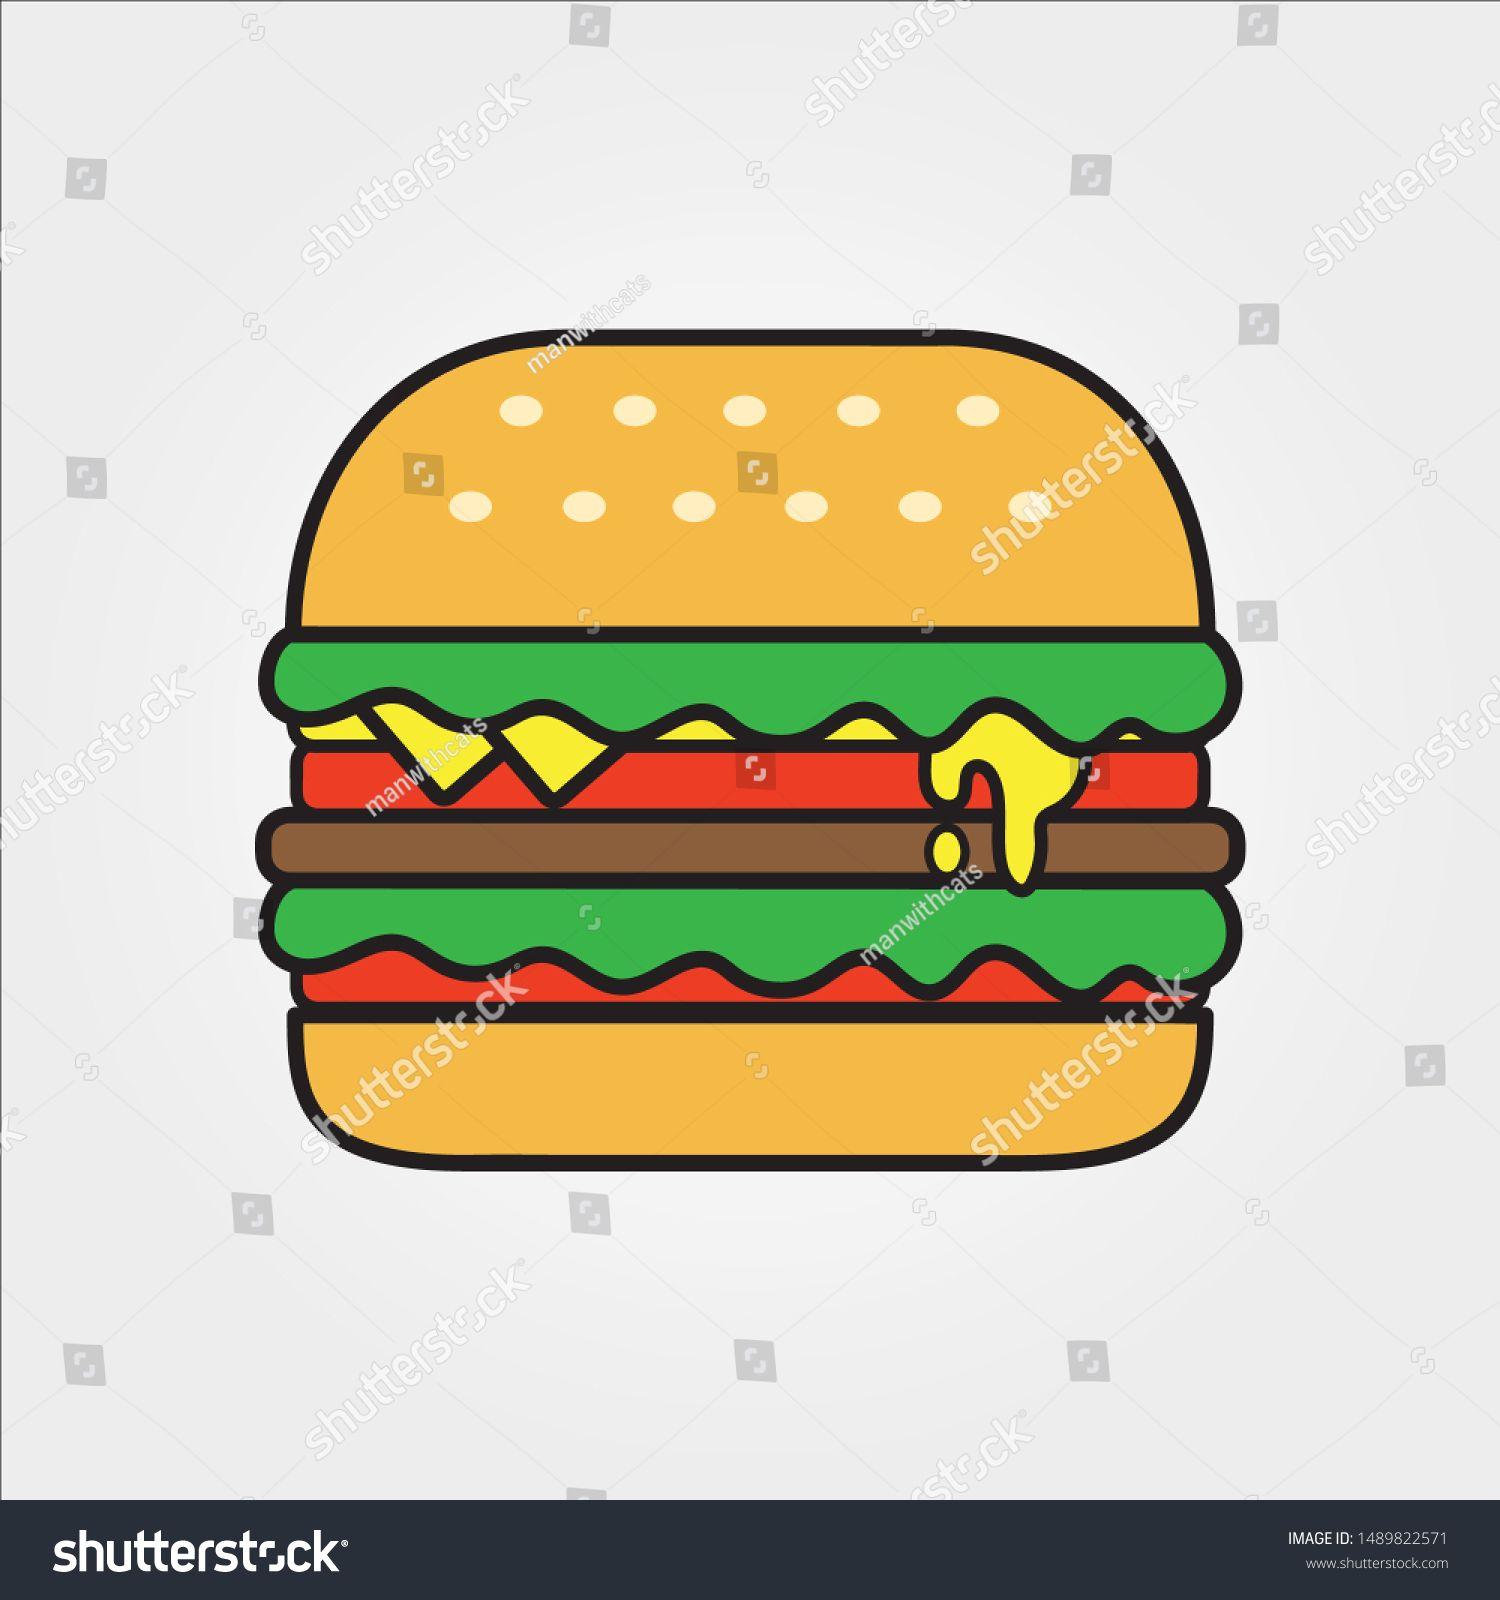 Hamburger Fast Food Vector business logo, icons template